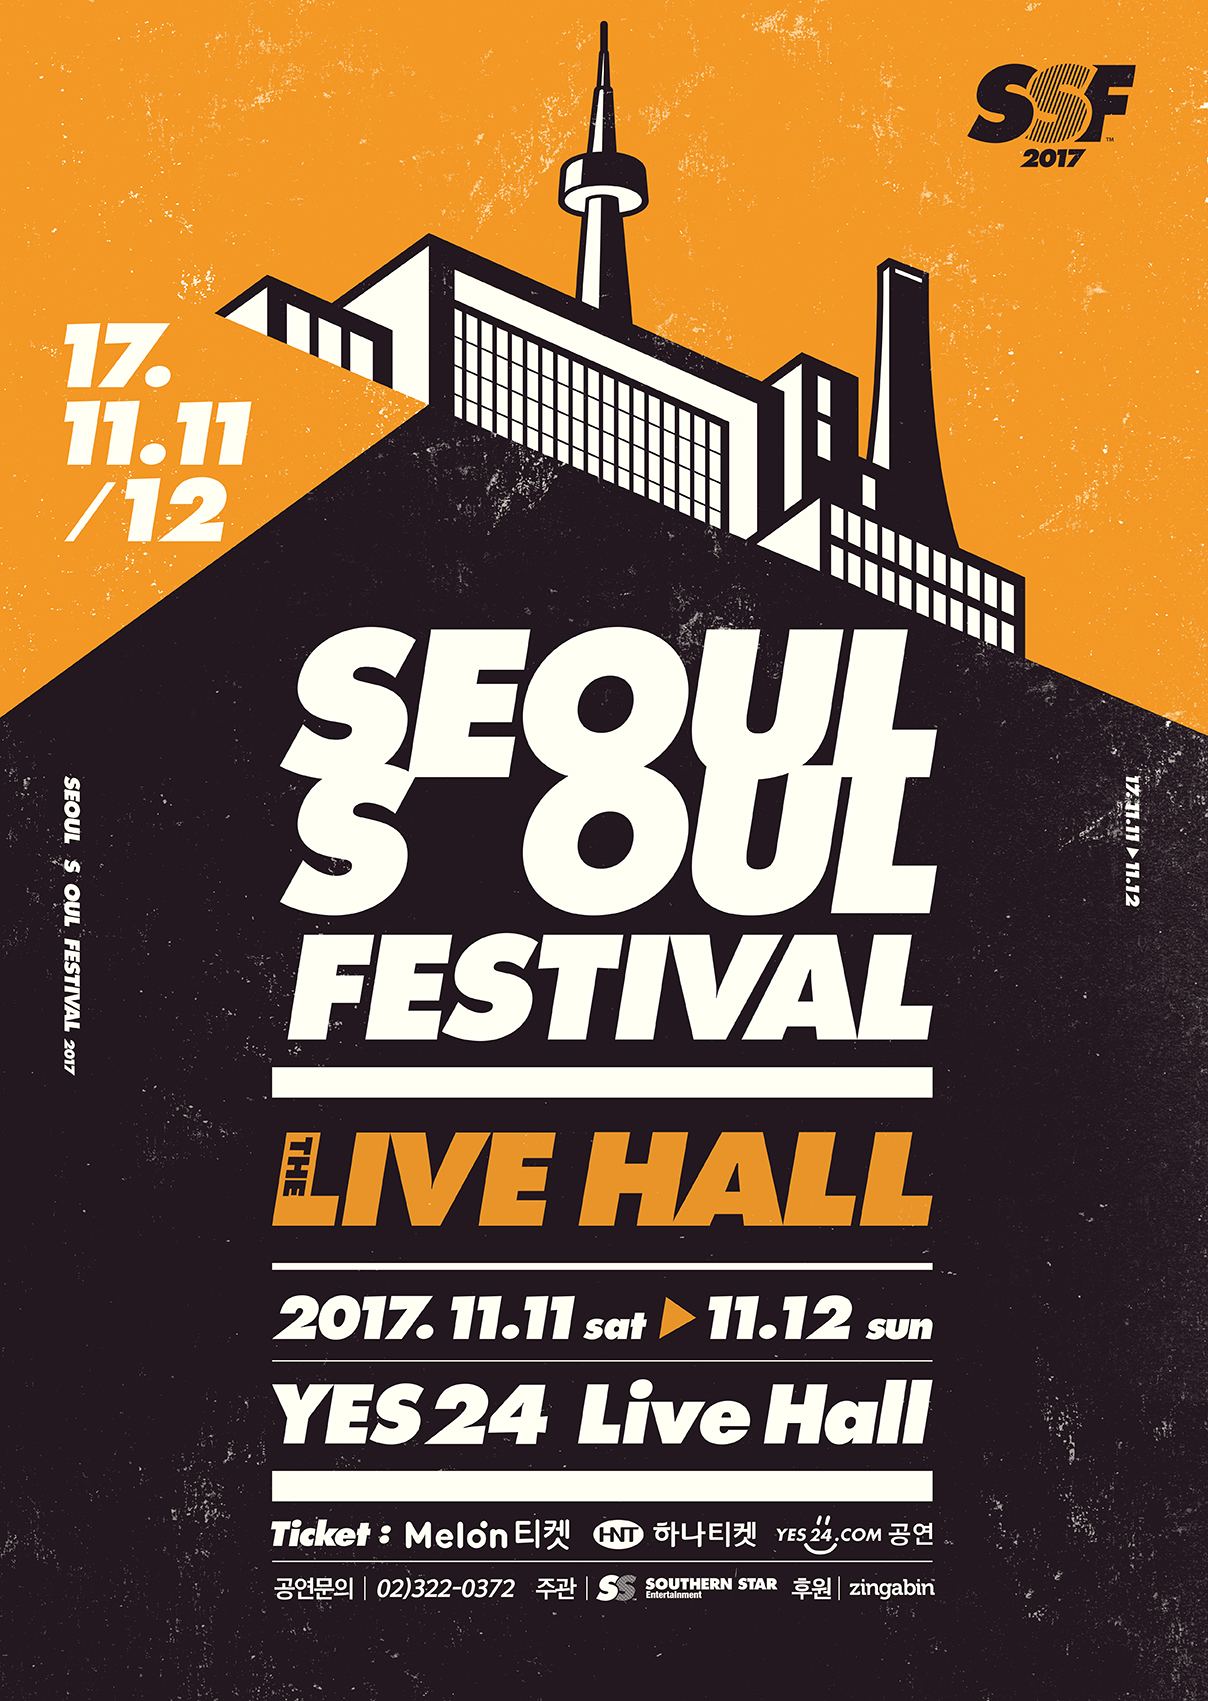 ssf2017LiveHall_poster_0901_web